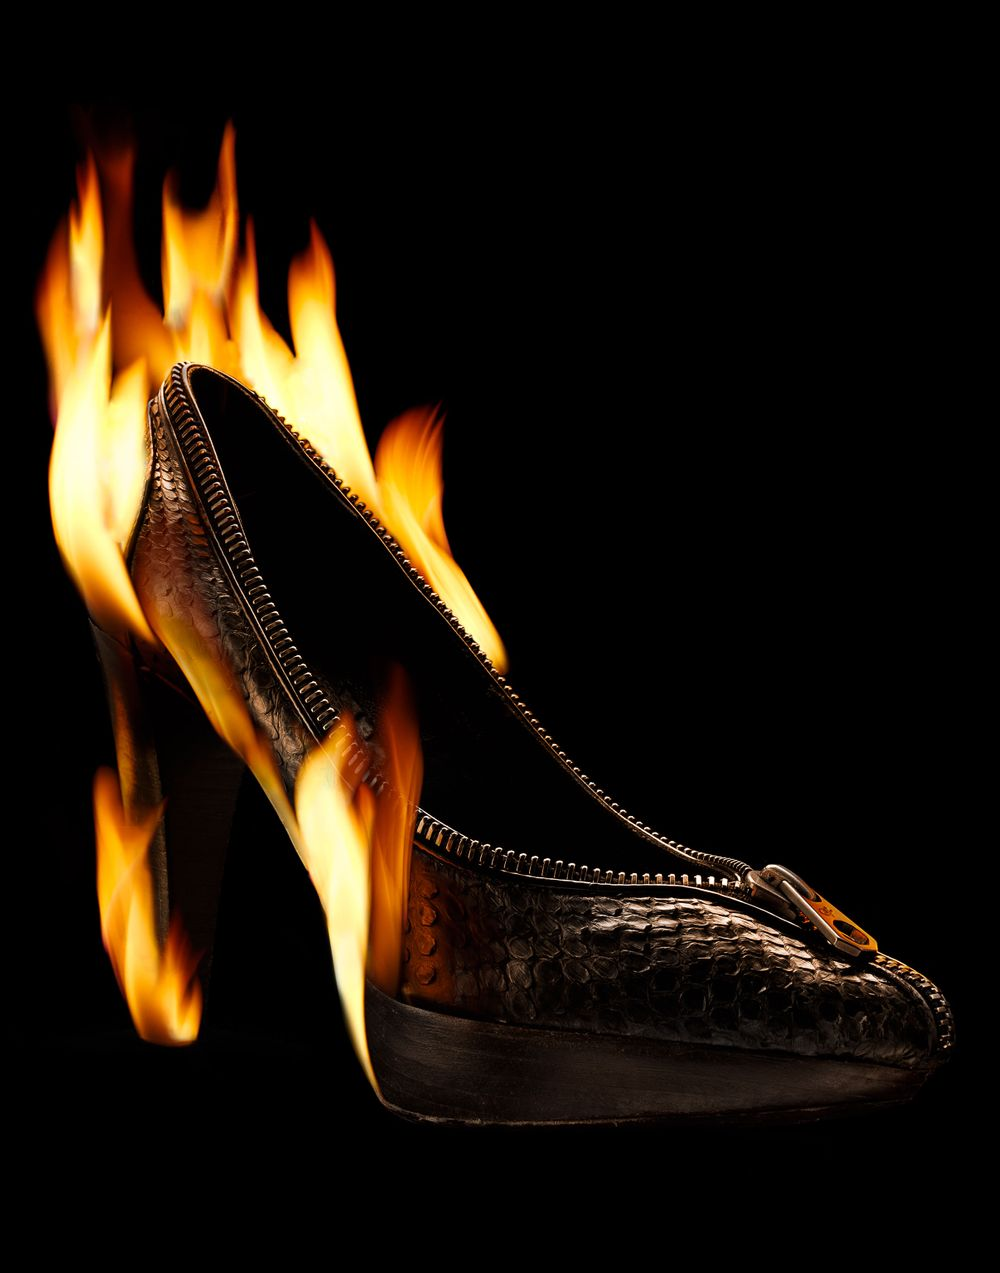 advertising footwear, pumps on fire